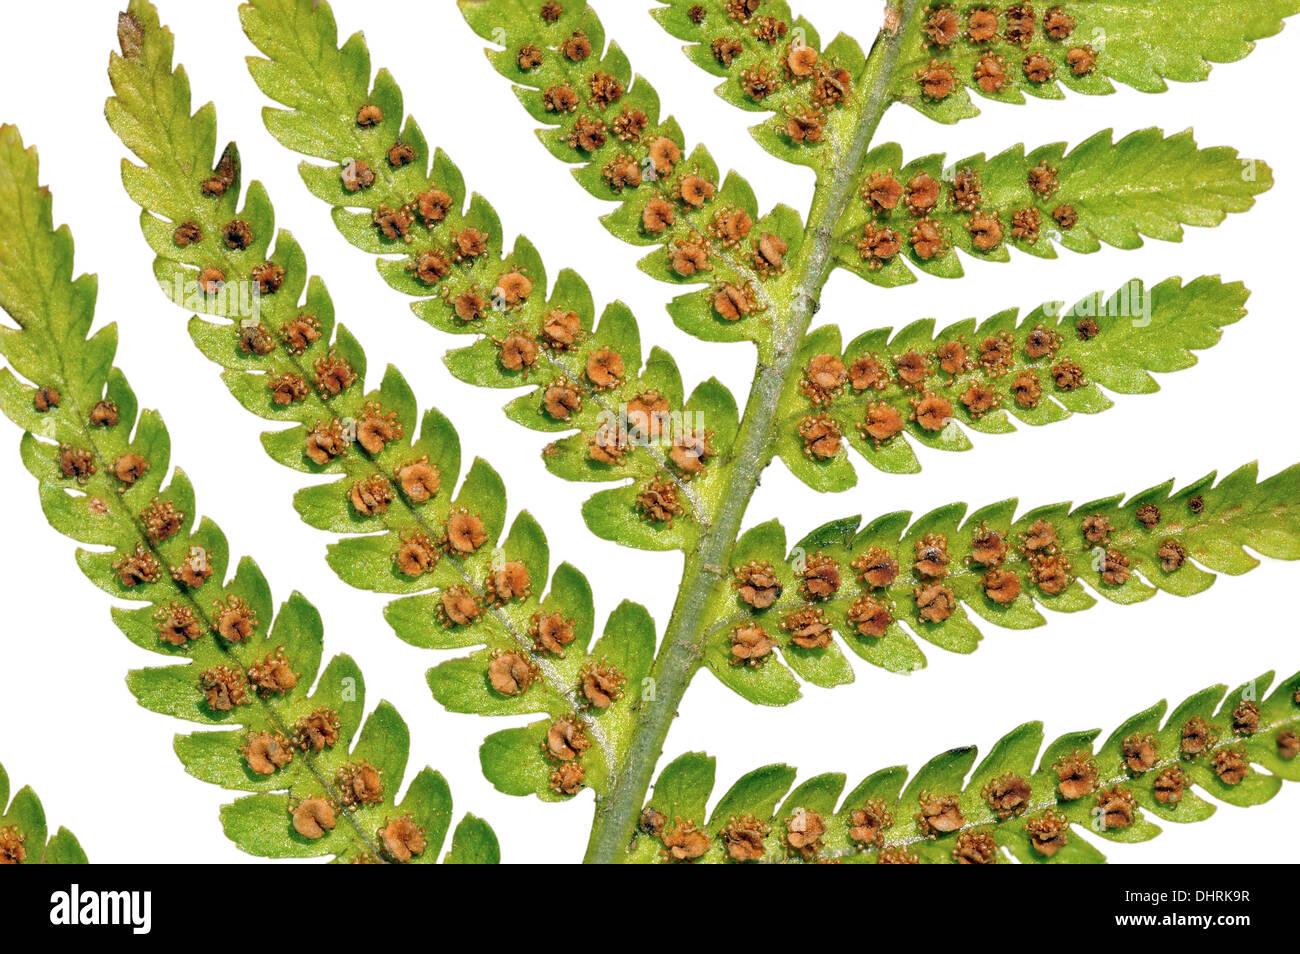 Leaf of the Male Fern with mature sporangia Stock Photo ... Fern Sporangia